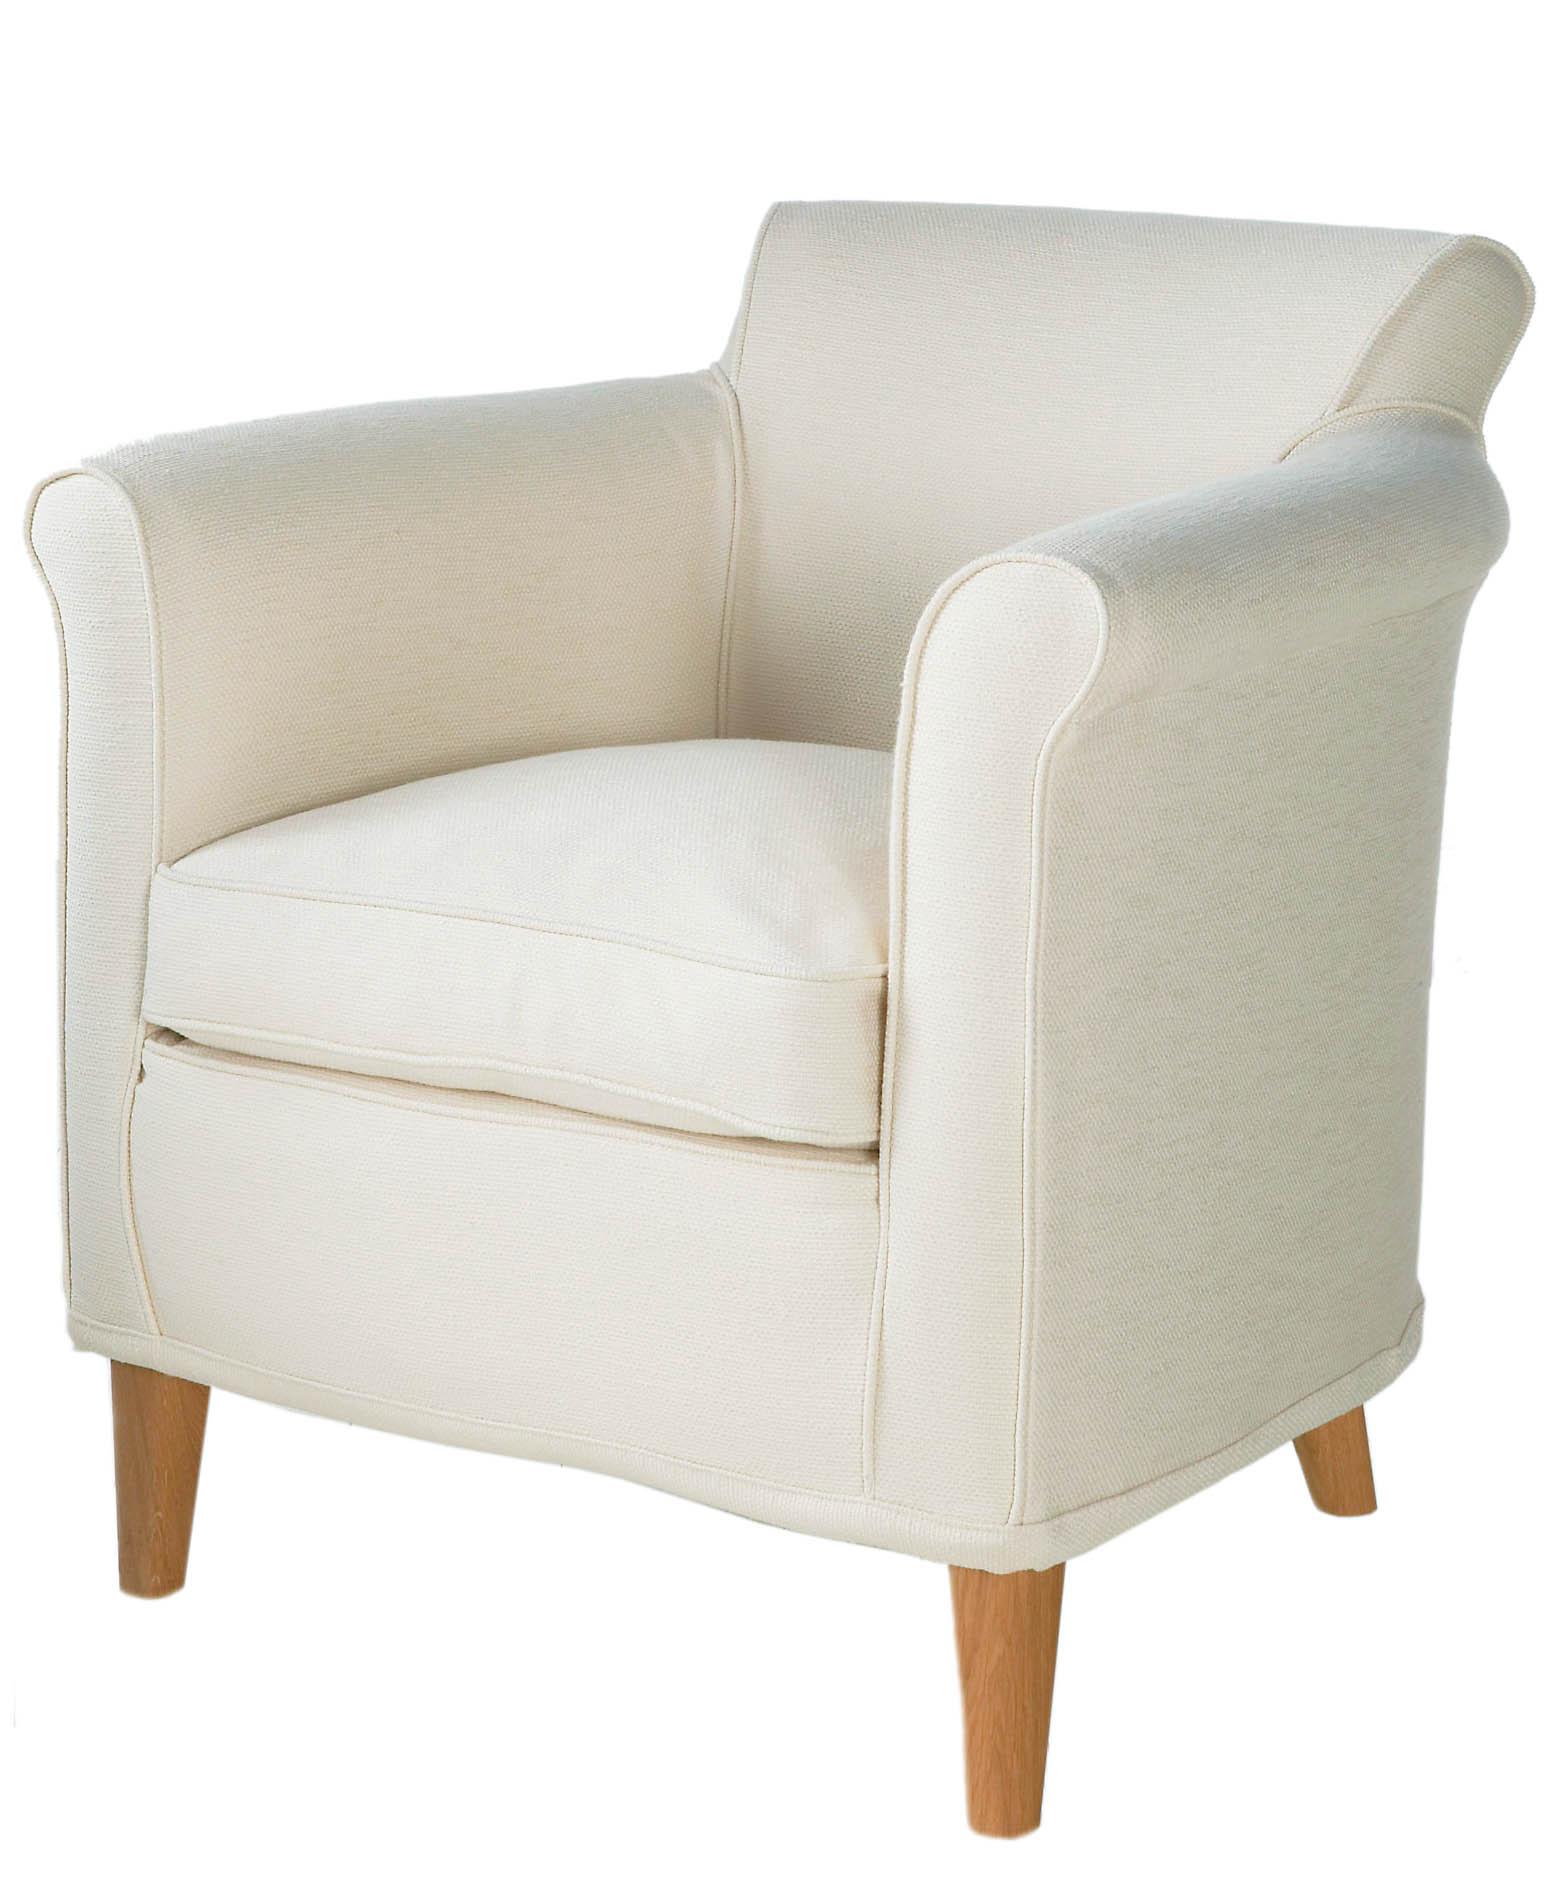 Ftlj Skinn 9 Soft Chairs By Borselius Design Soft Chairs By Borselius Design Epsteam Bumble